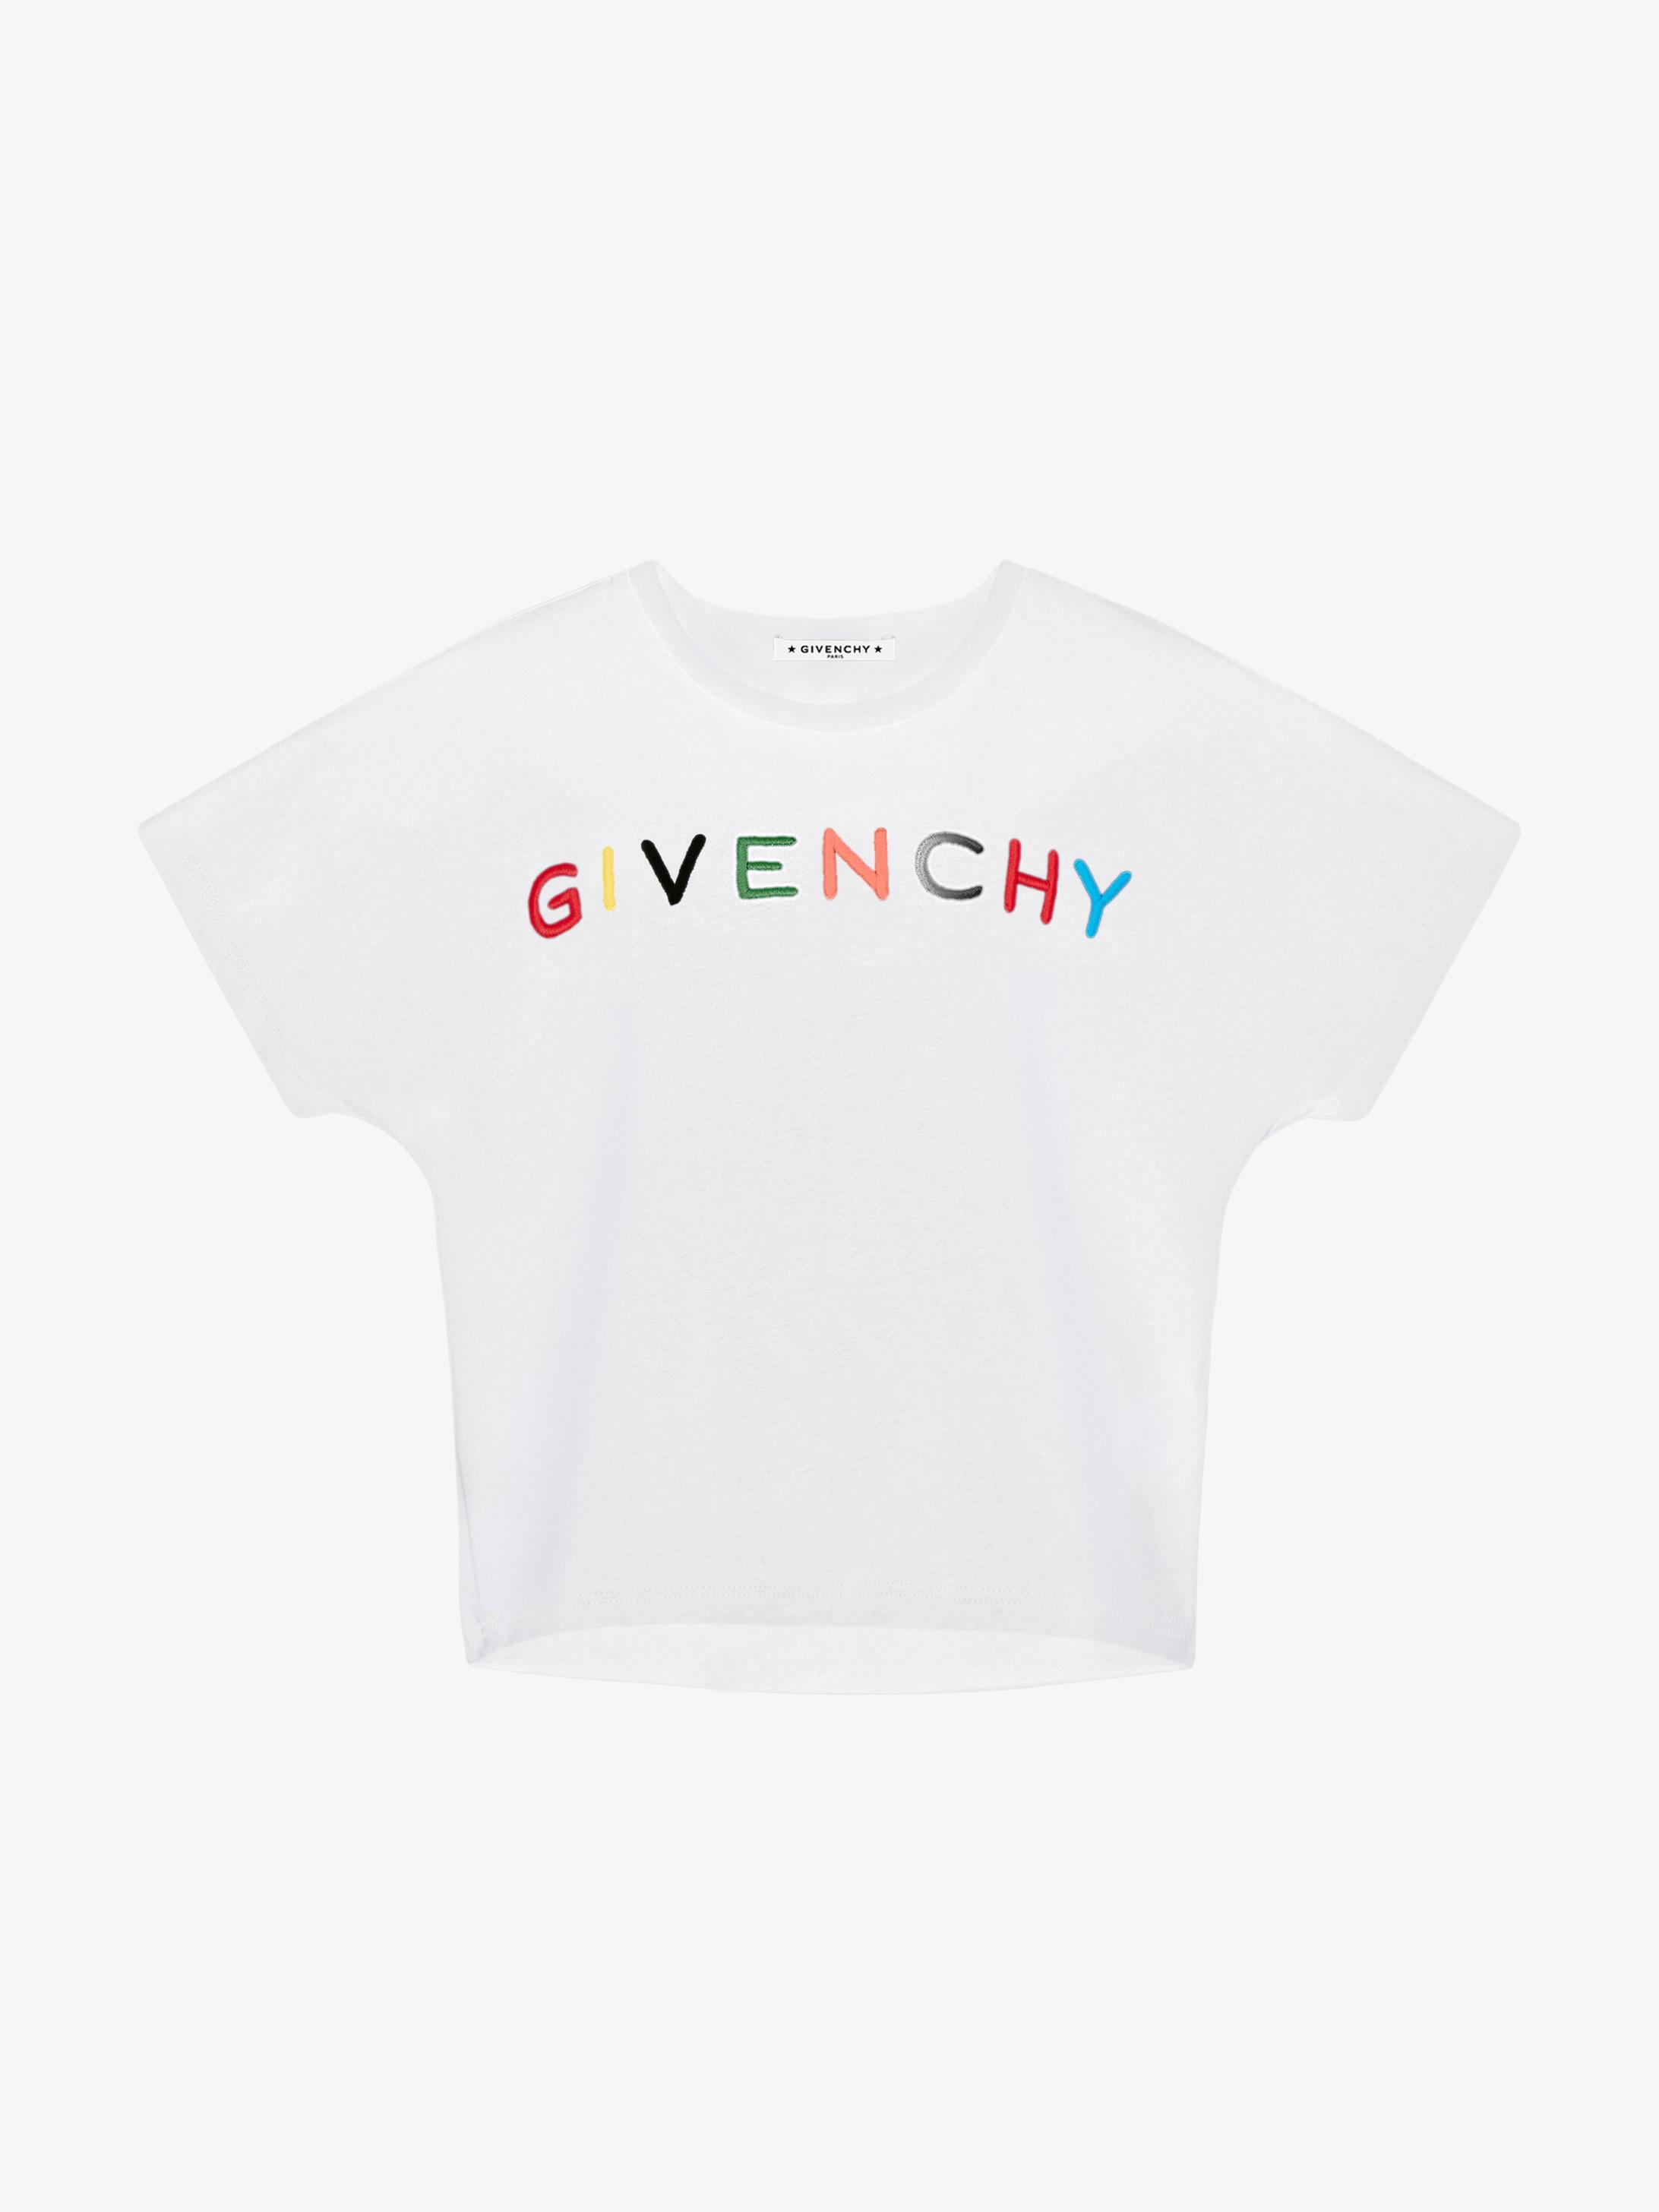 GIVENCHY刺绣T恤